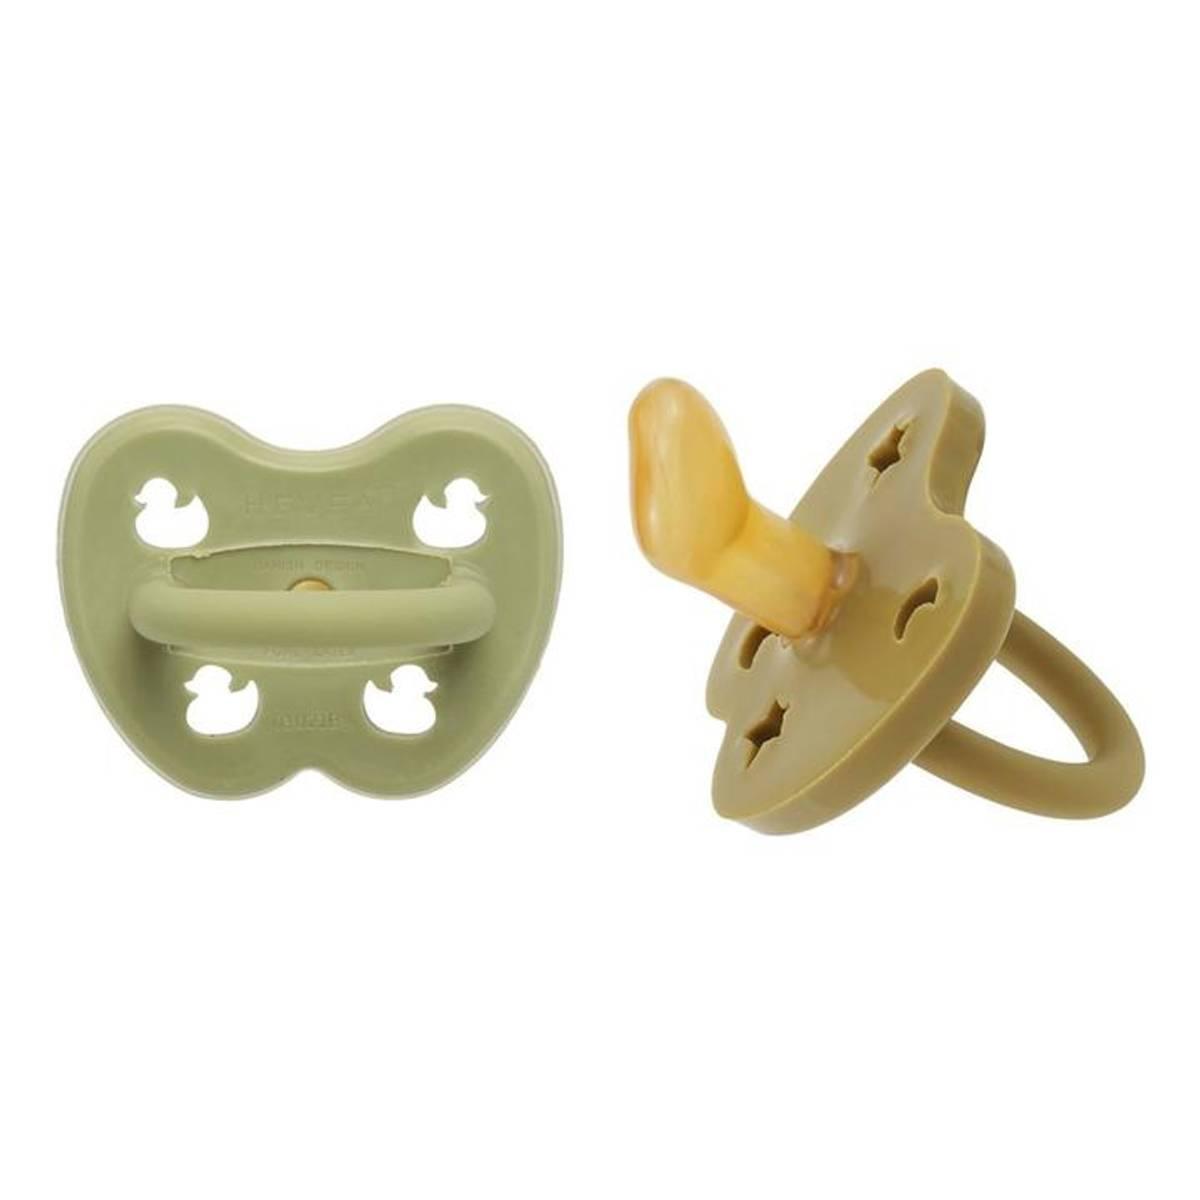 2-pk Ortodontisk smokk 3-36 mnd, Hunter Green&Olive / Hevea